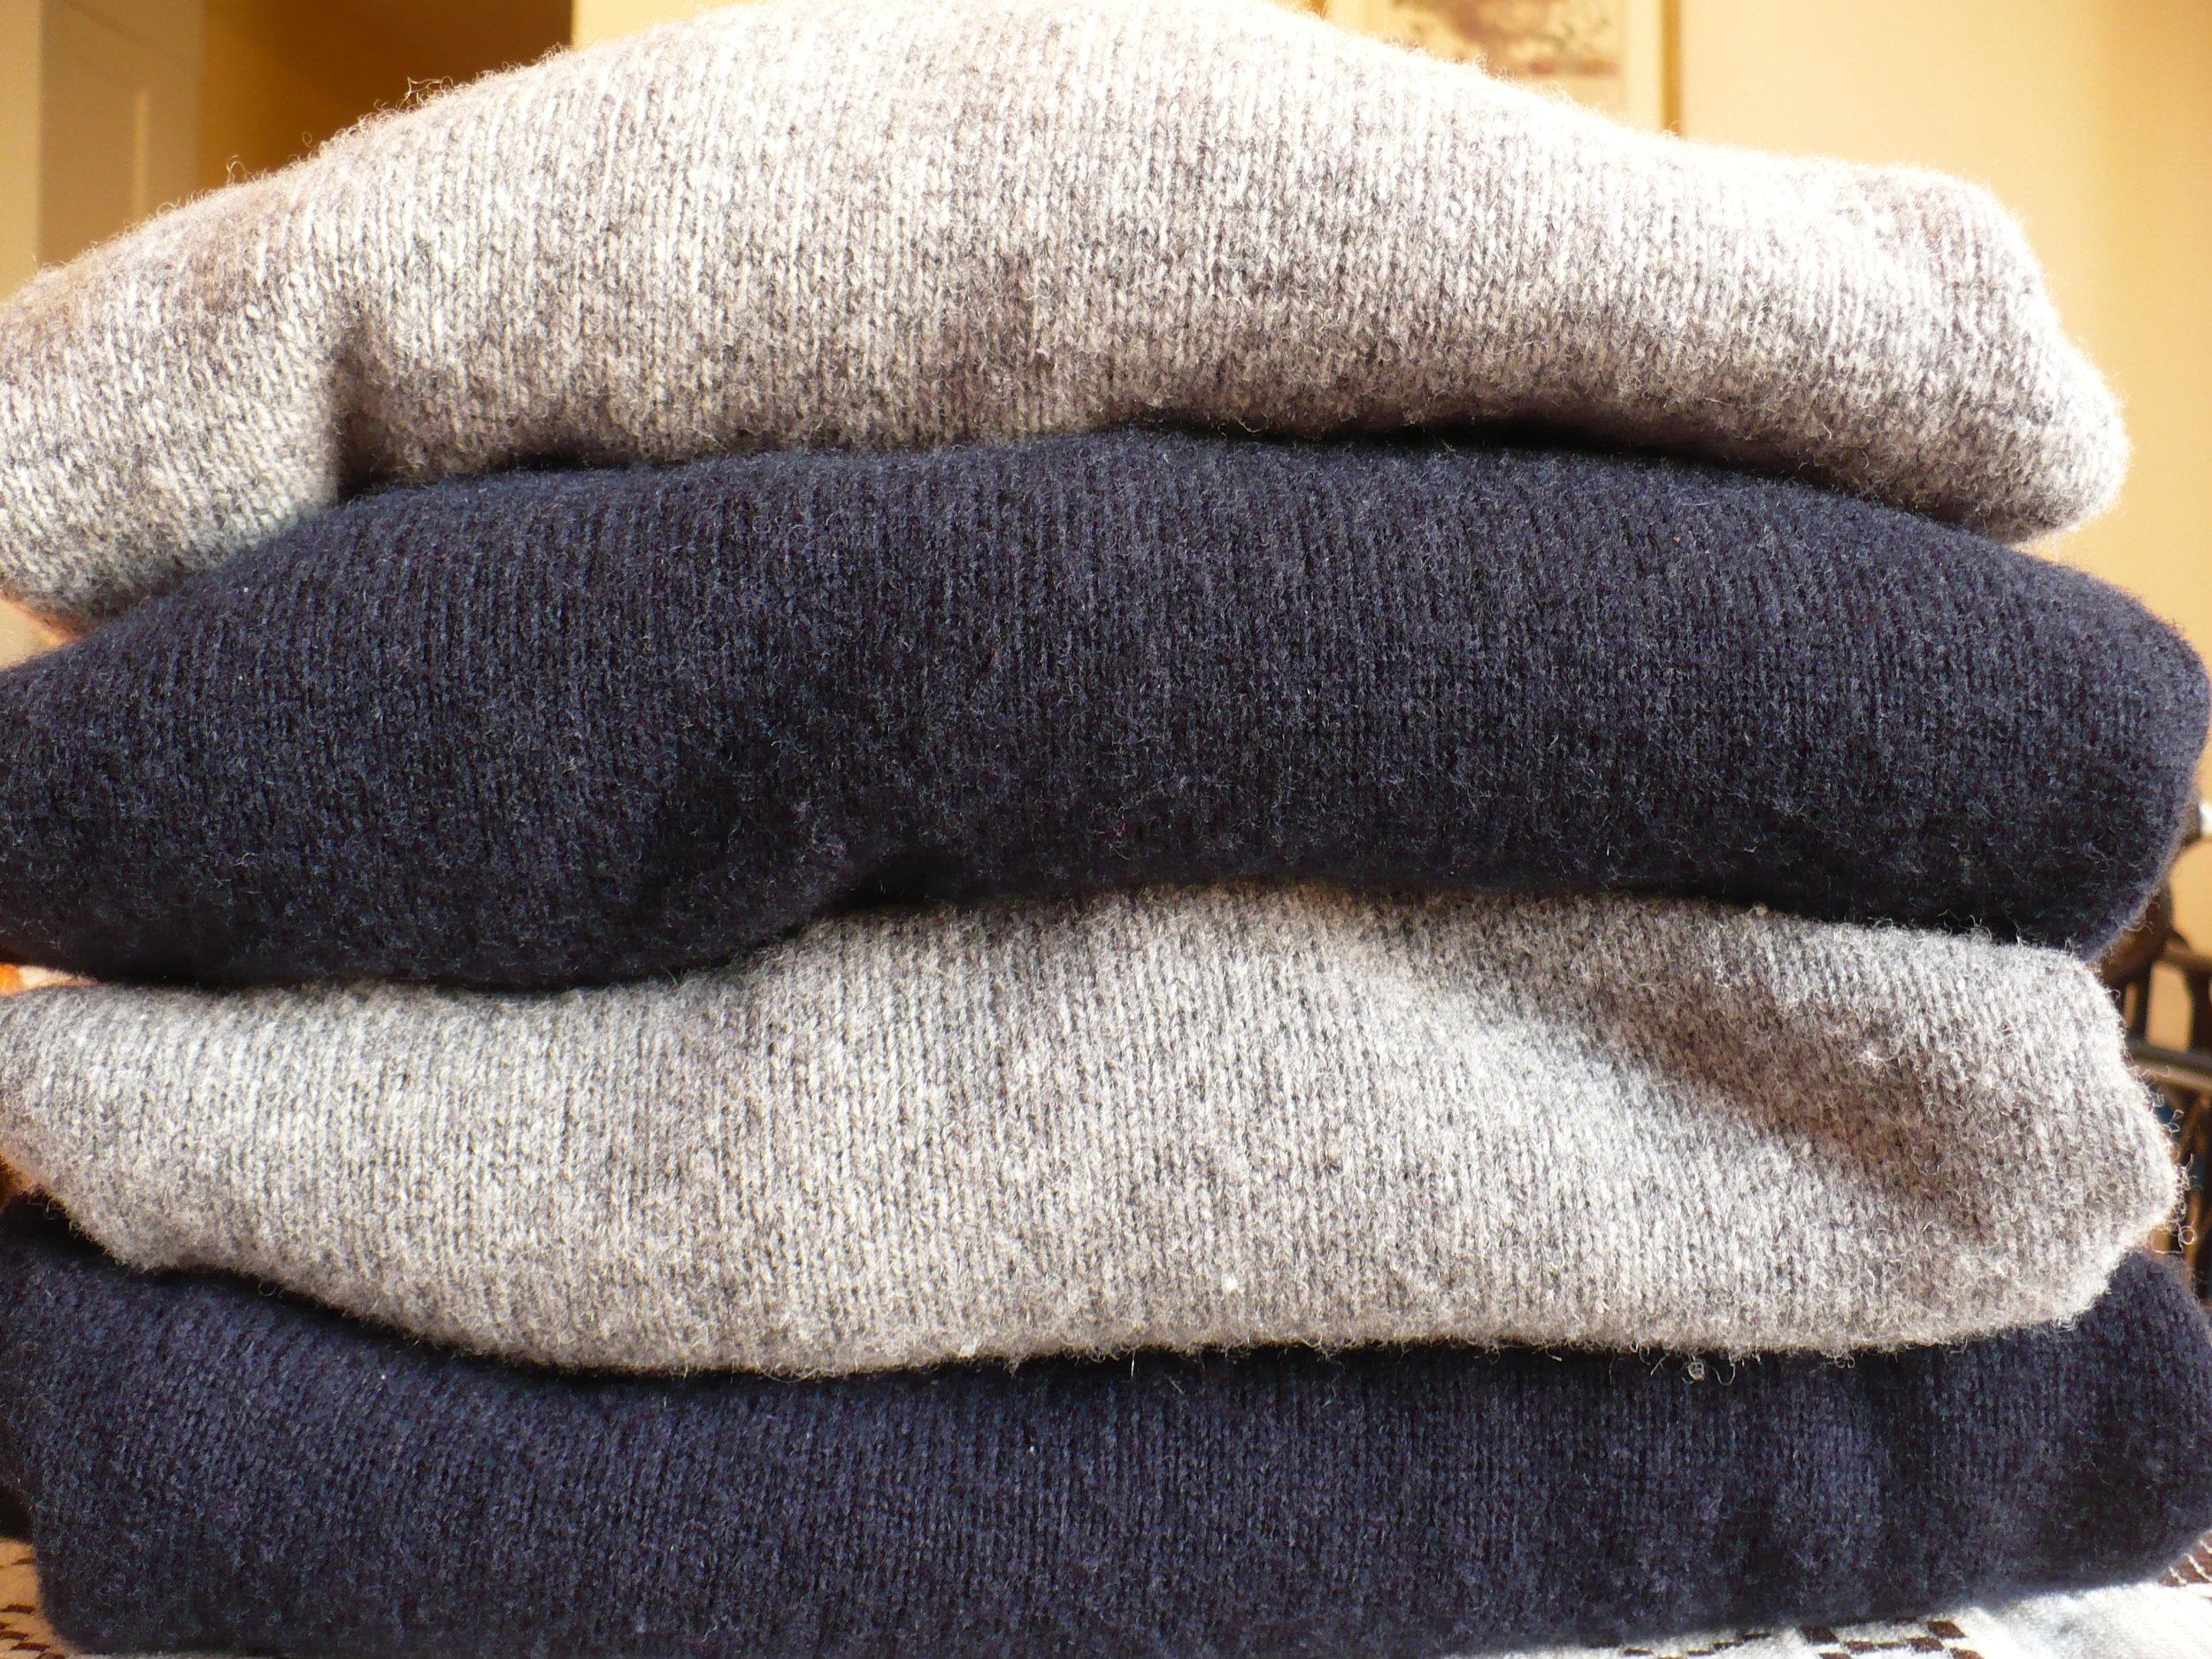 J Crew Lambswool Sweater.